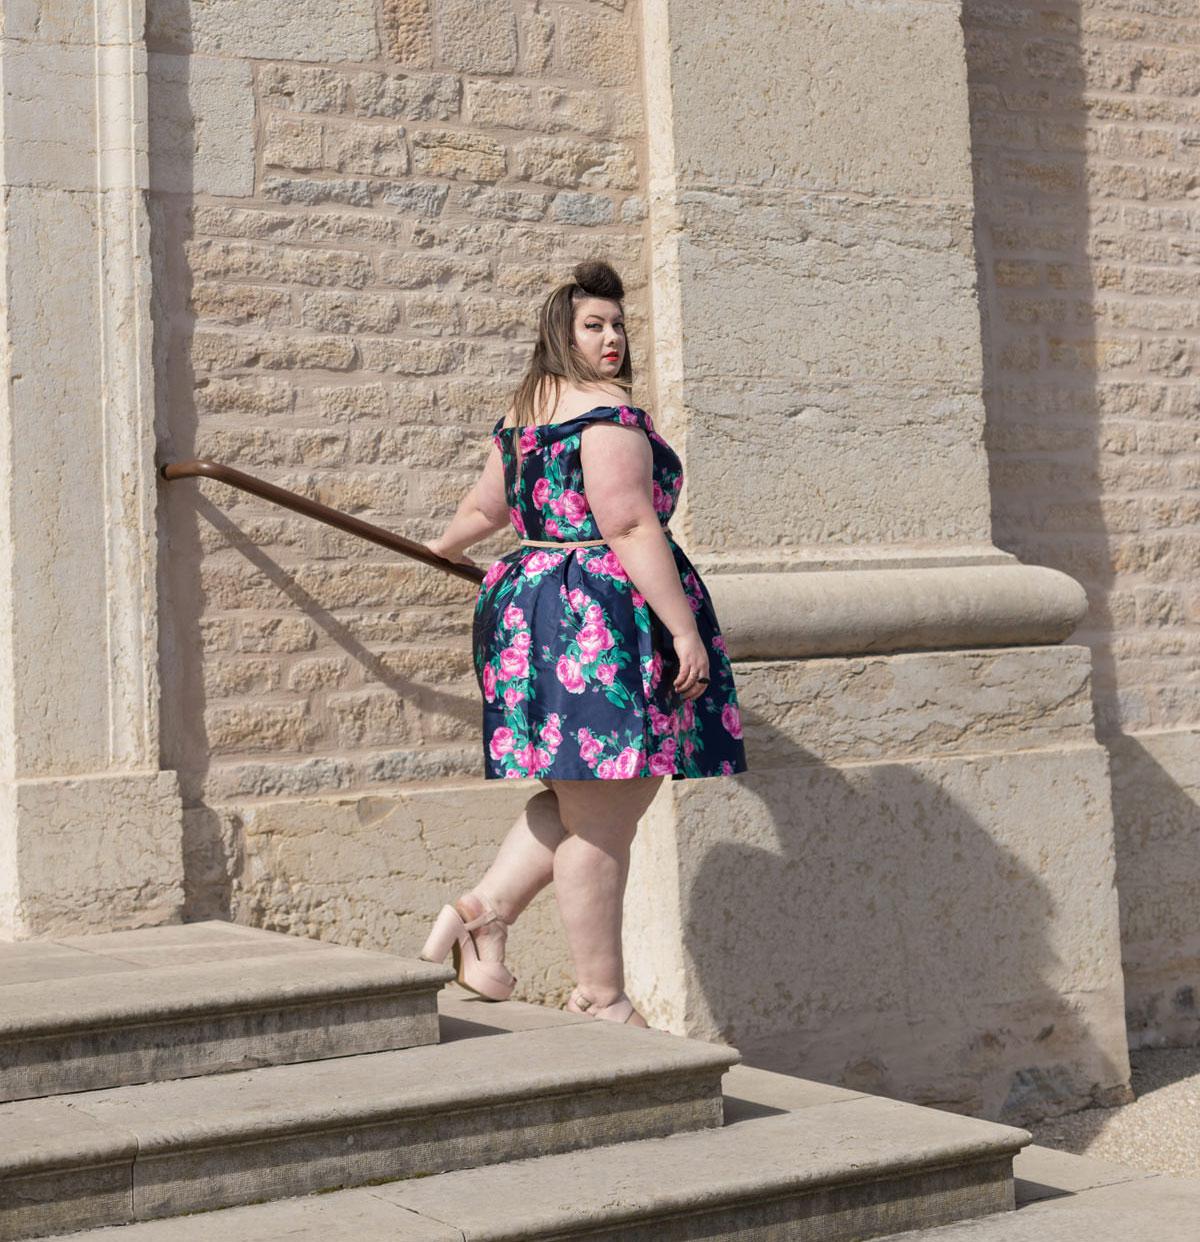 wedding dress chichi london curve plus size curvy girl plus size blogger ronde grande taille